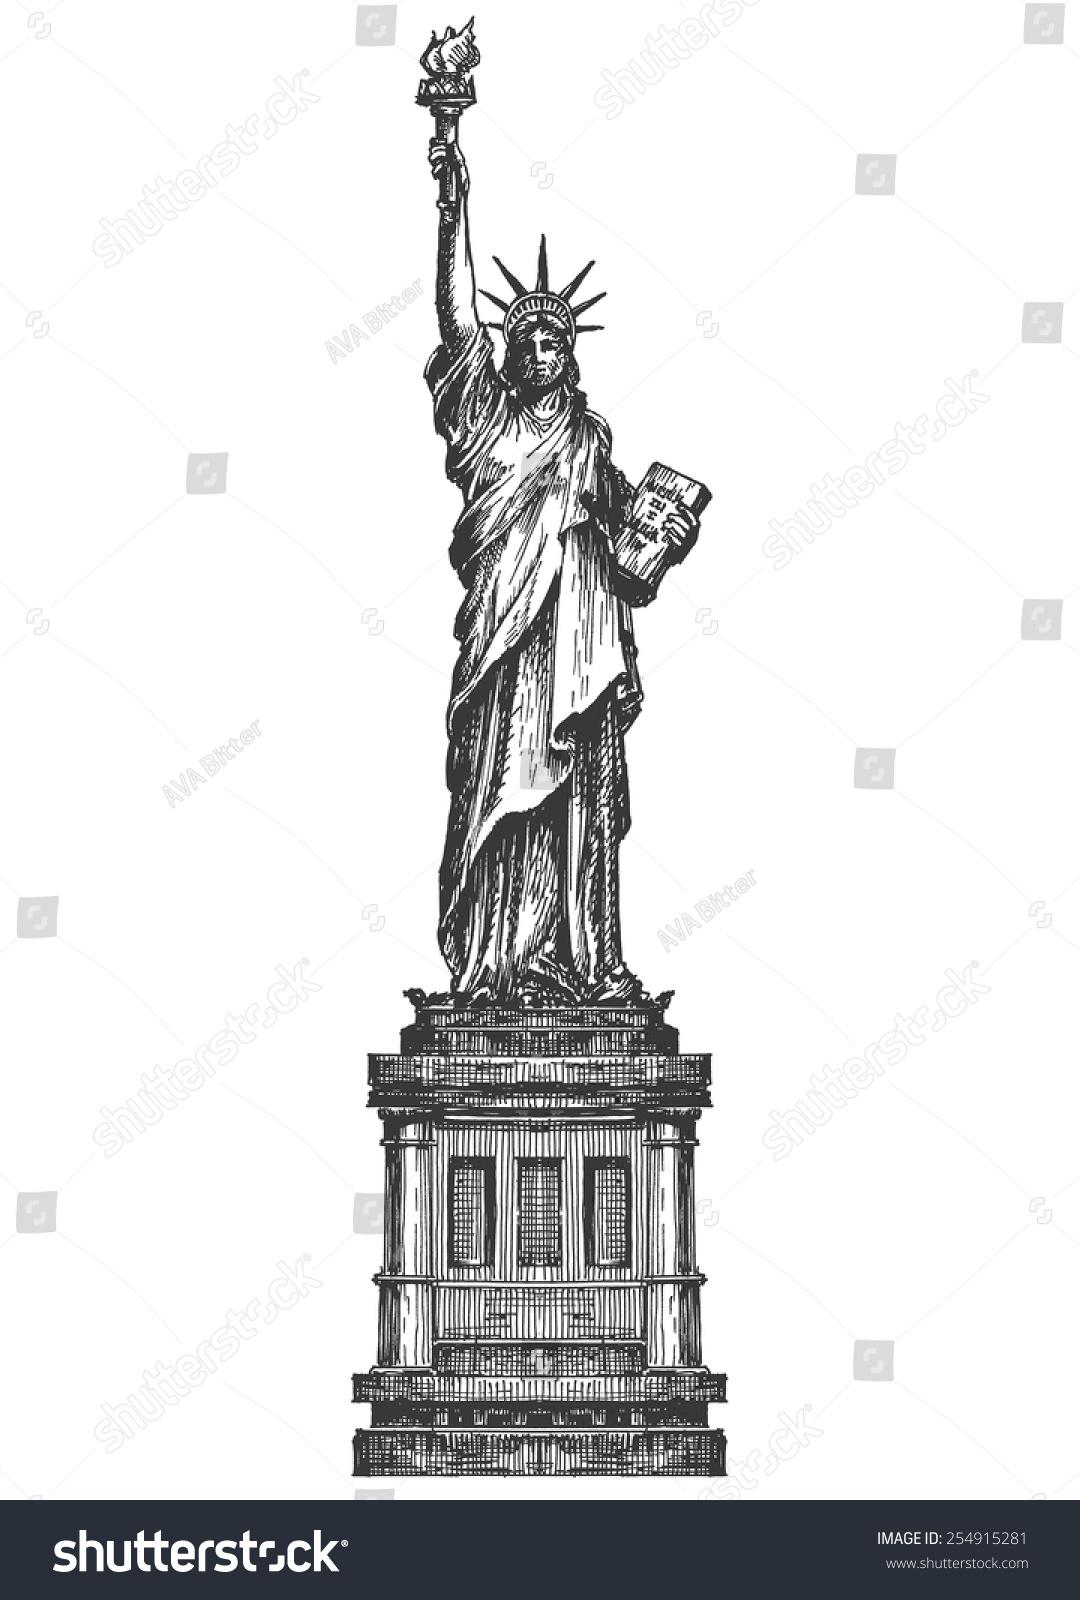 statue liberty logo design template america stock vector 254915281 shutterstock. Black Bedroom Furniture Sets. Home Design Ideas